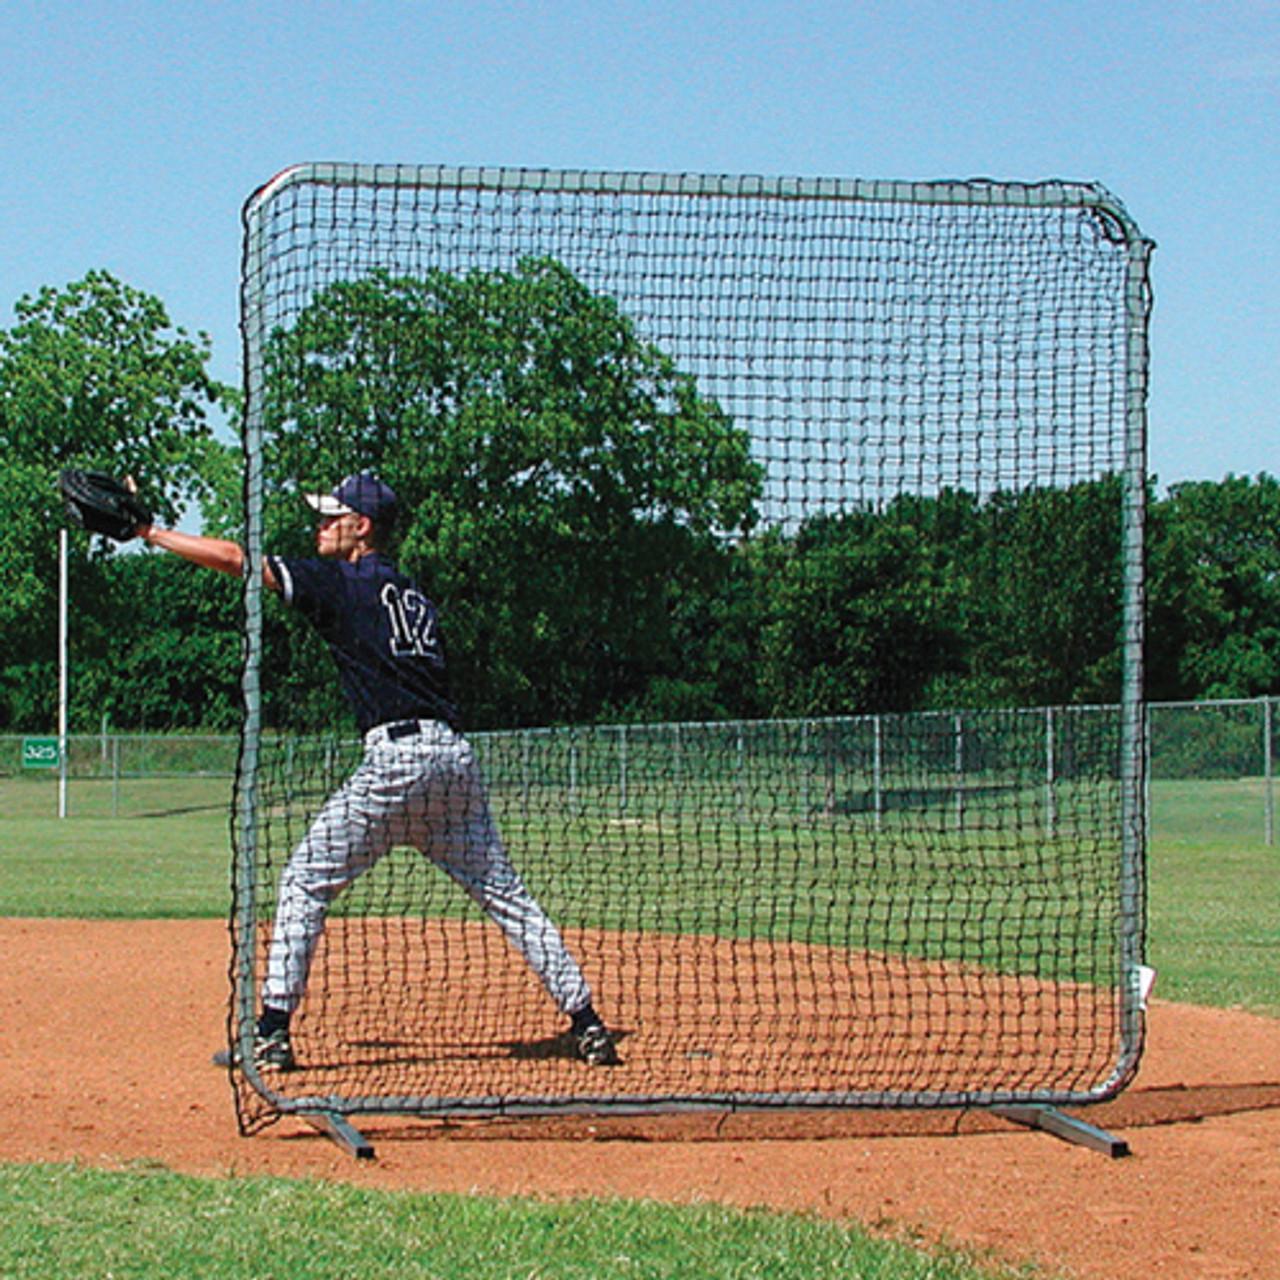 Baseball Collegiate First base / fungo protector screen